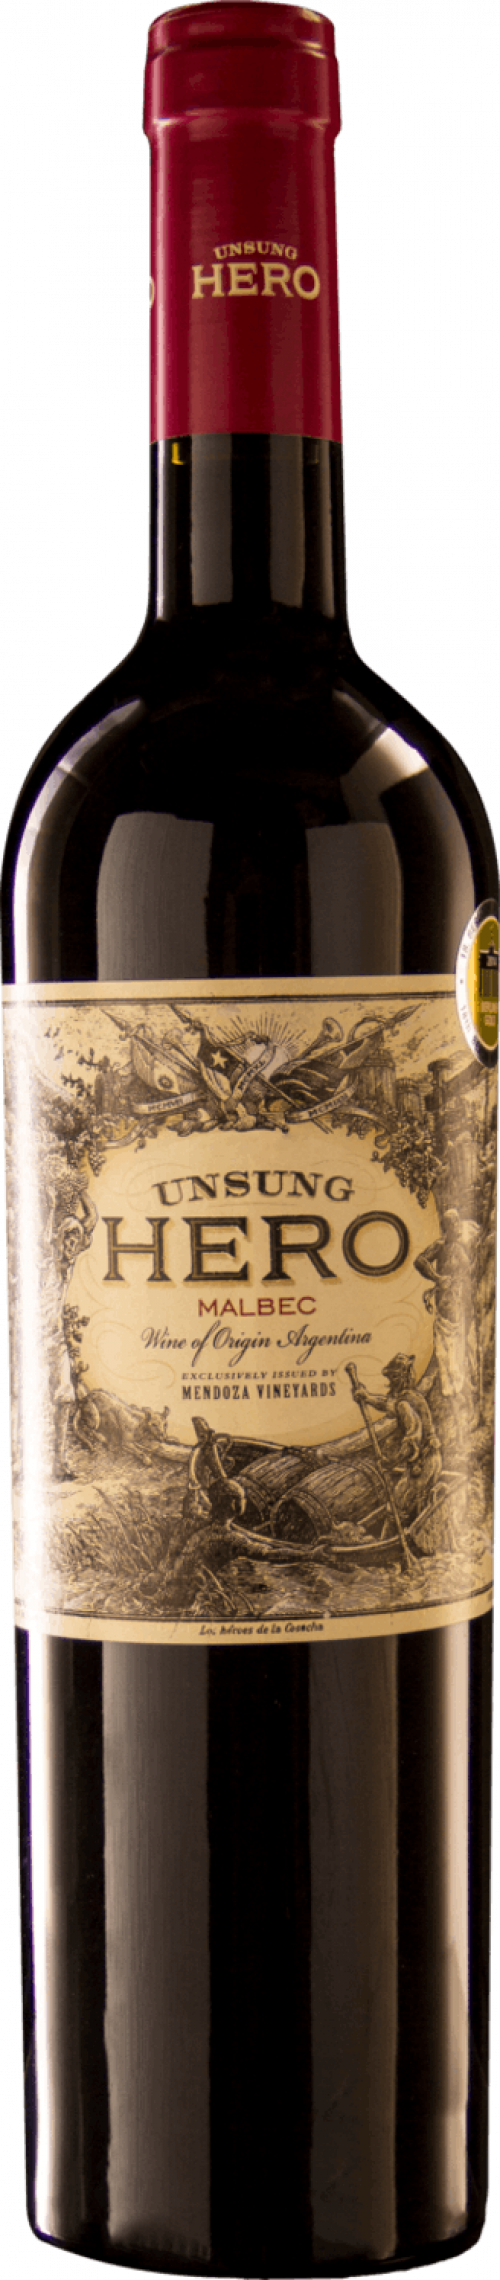 2018 Unsung Hero Malbec 750ml